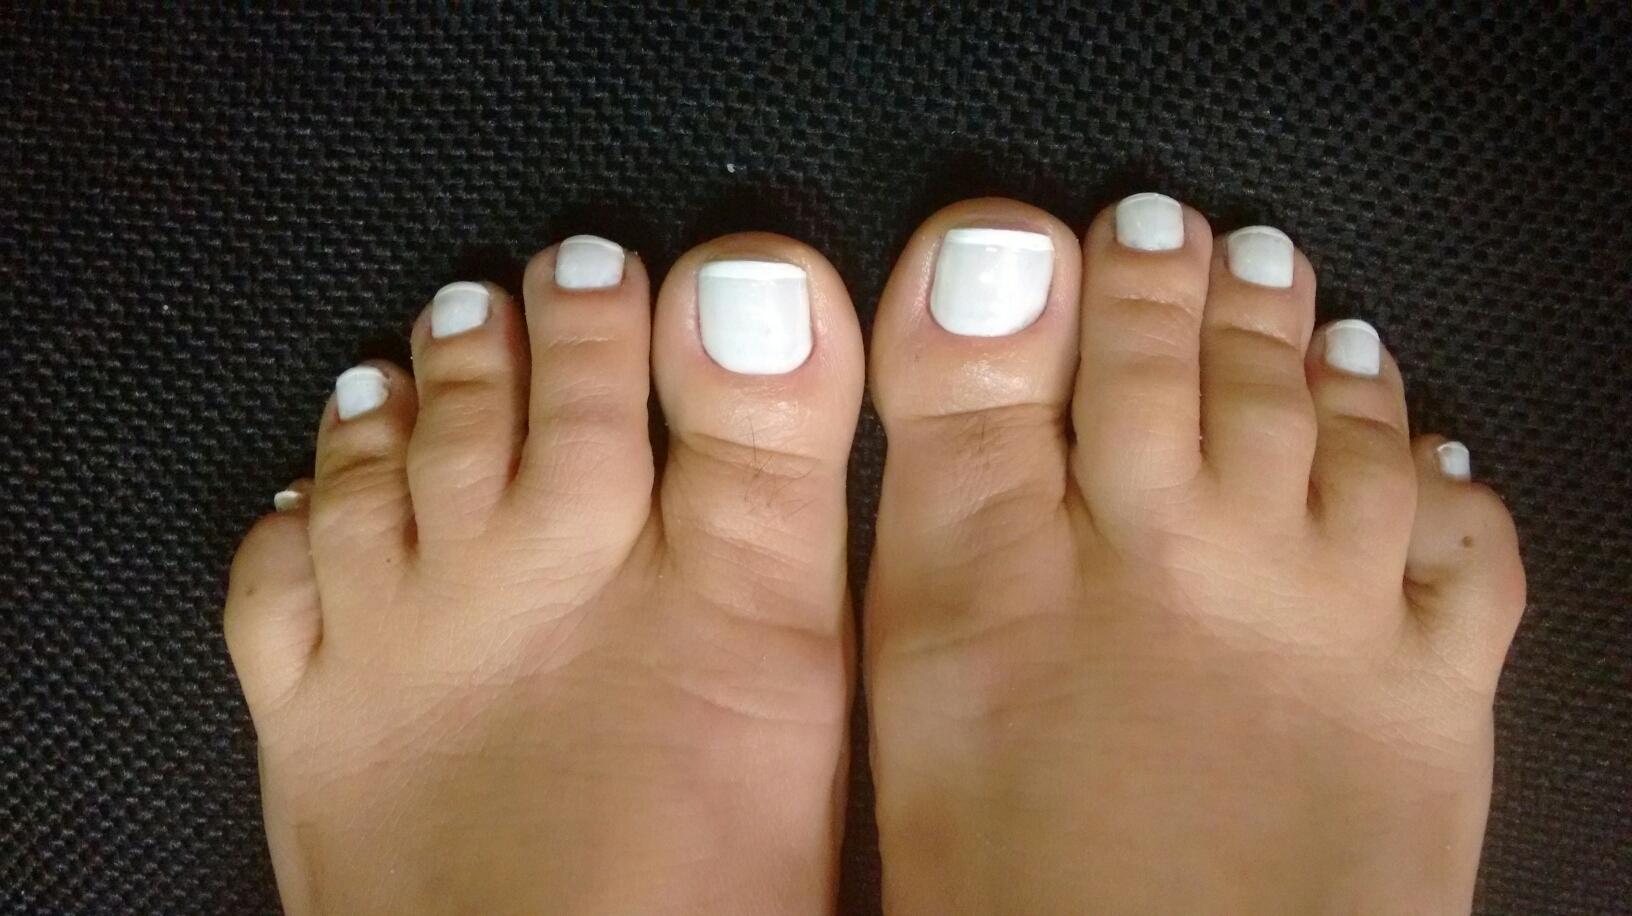 francesinha branca, básica, dia-a-dia unhas  manicure e pedicure